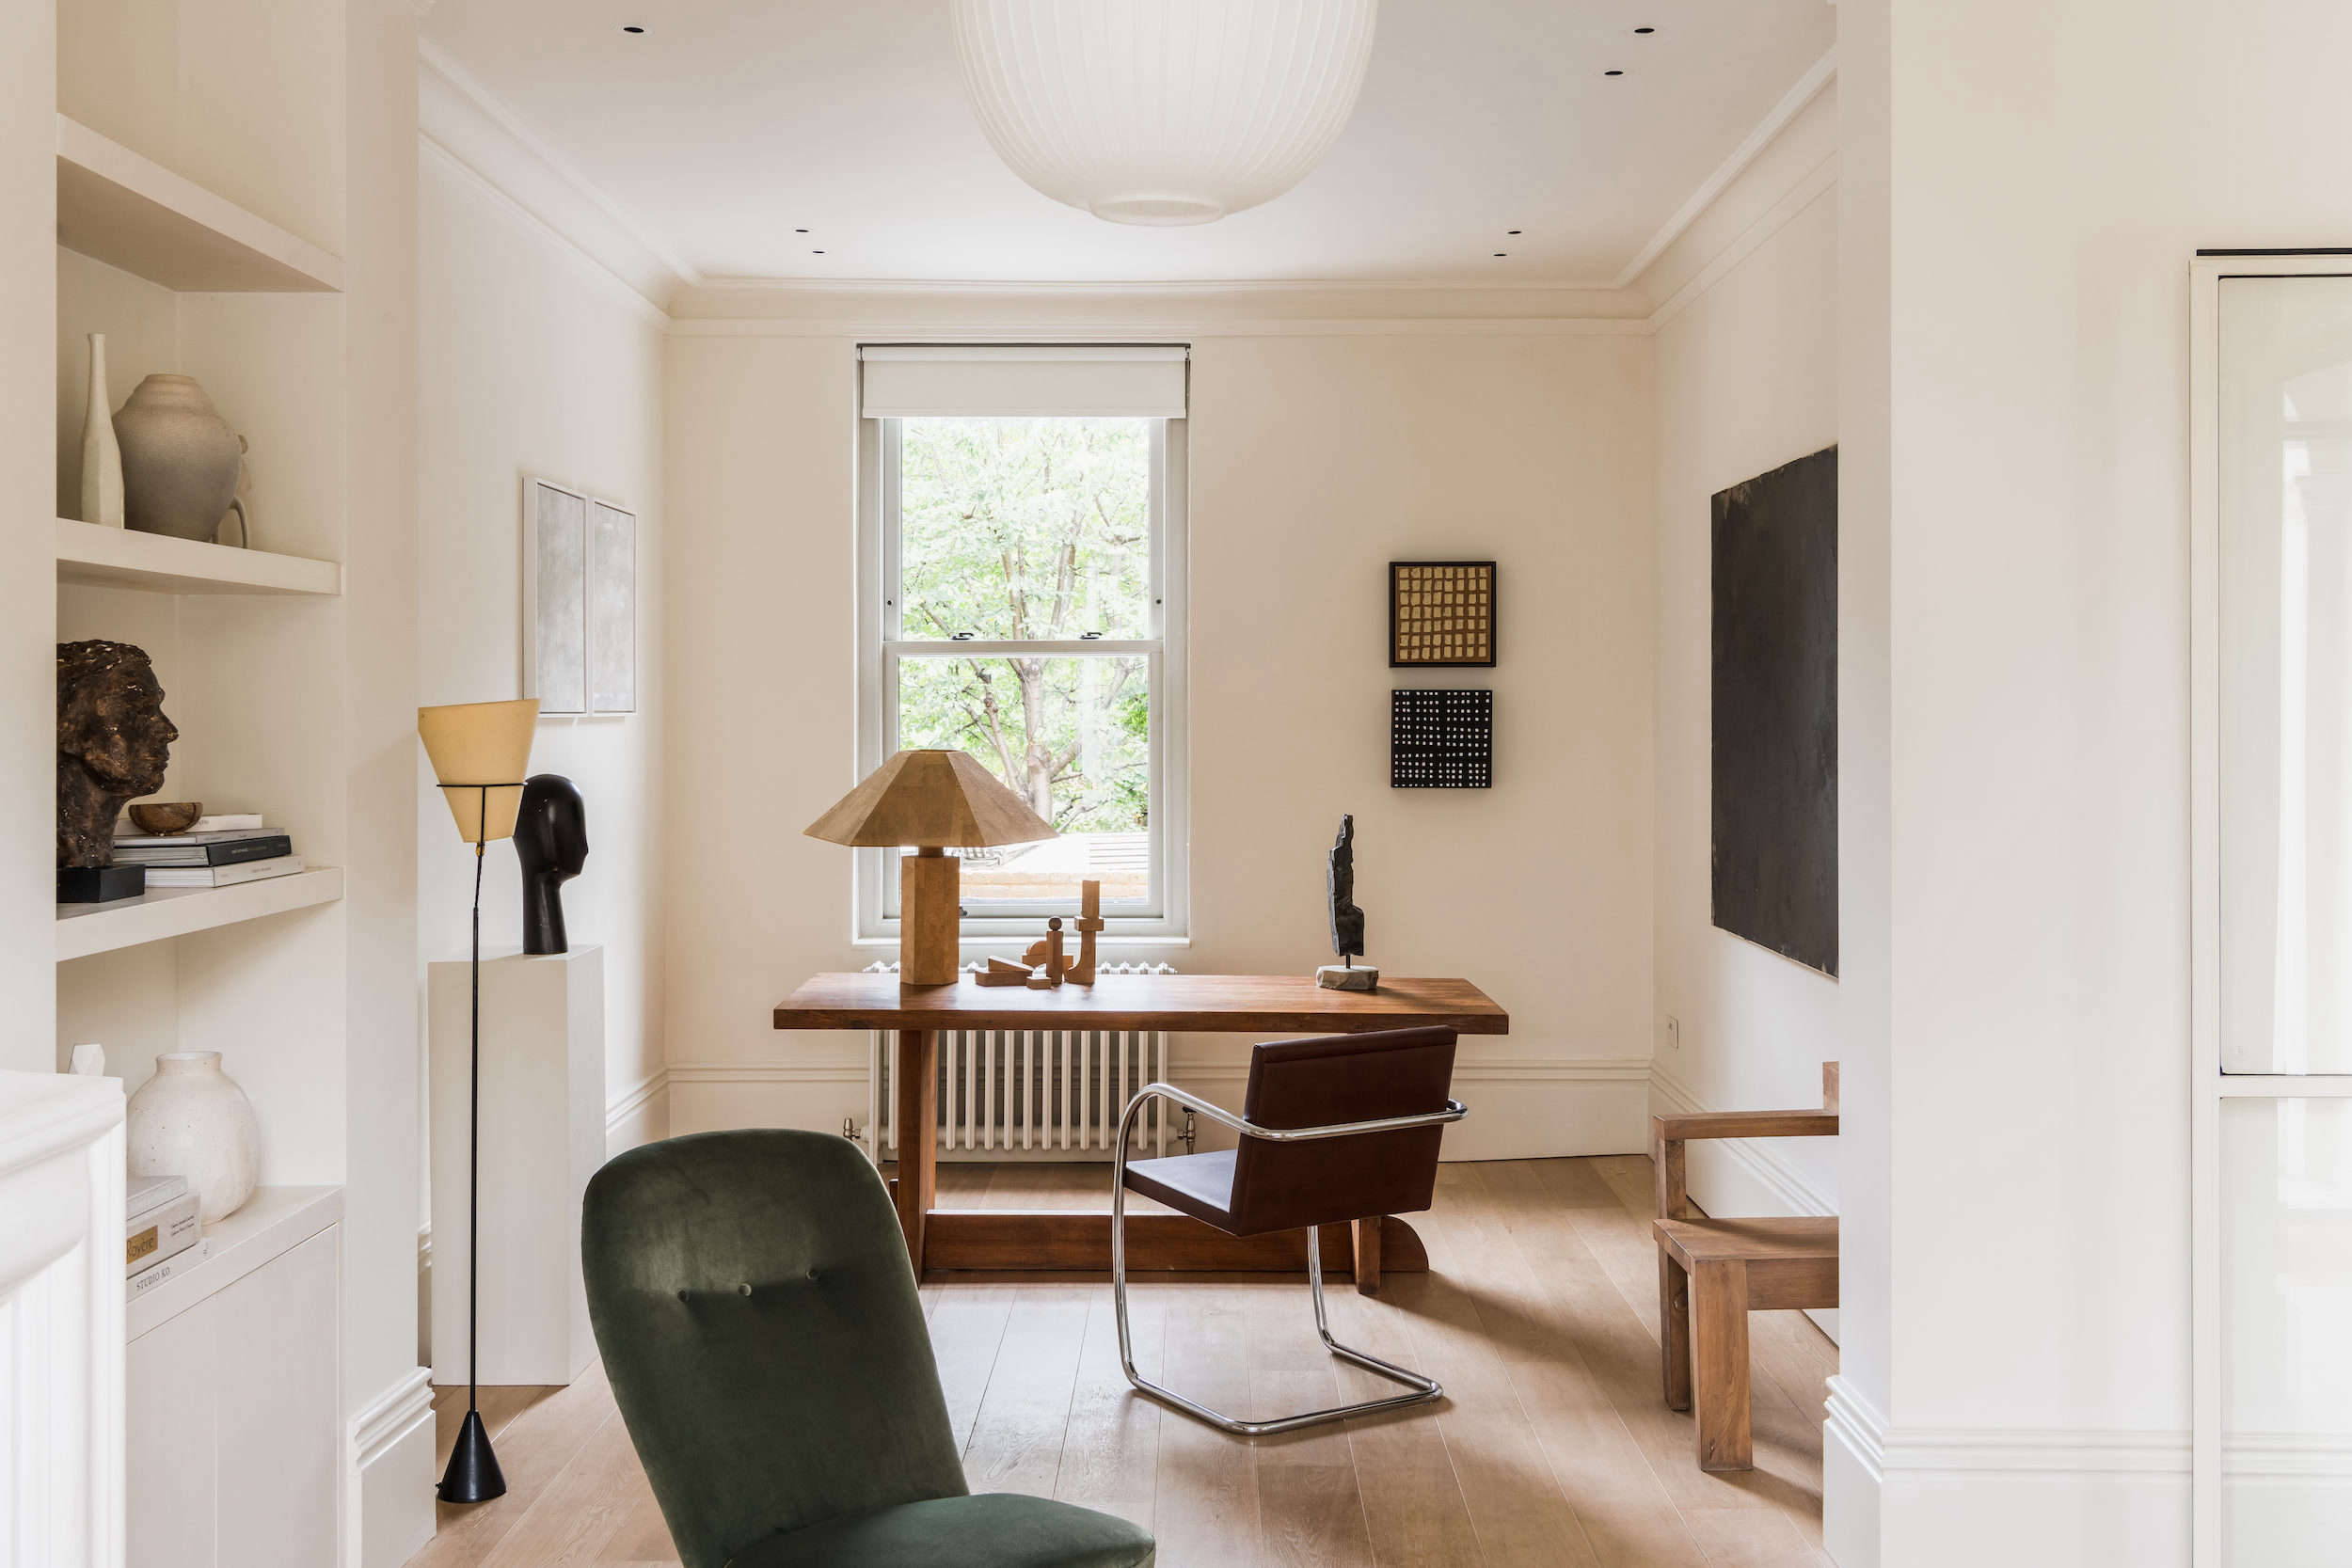 A Tale of Two Styles: Proper Victorian on the Outside, Modern Zen on the Inside - Remodelista